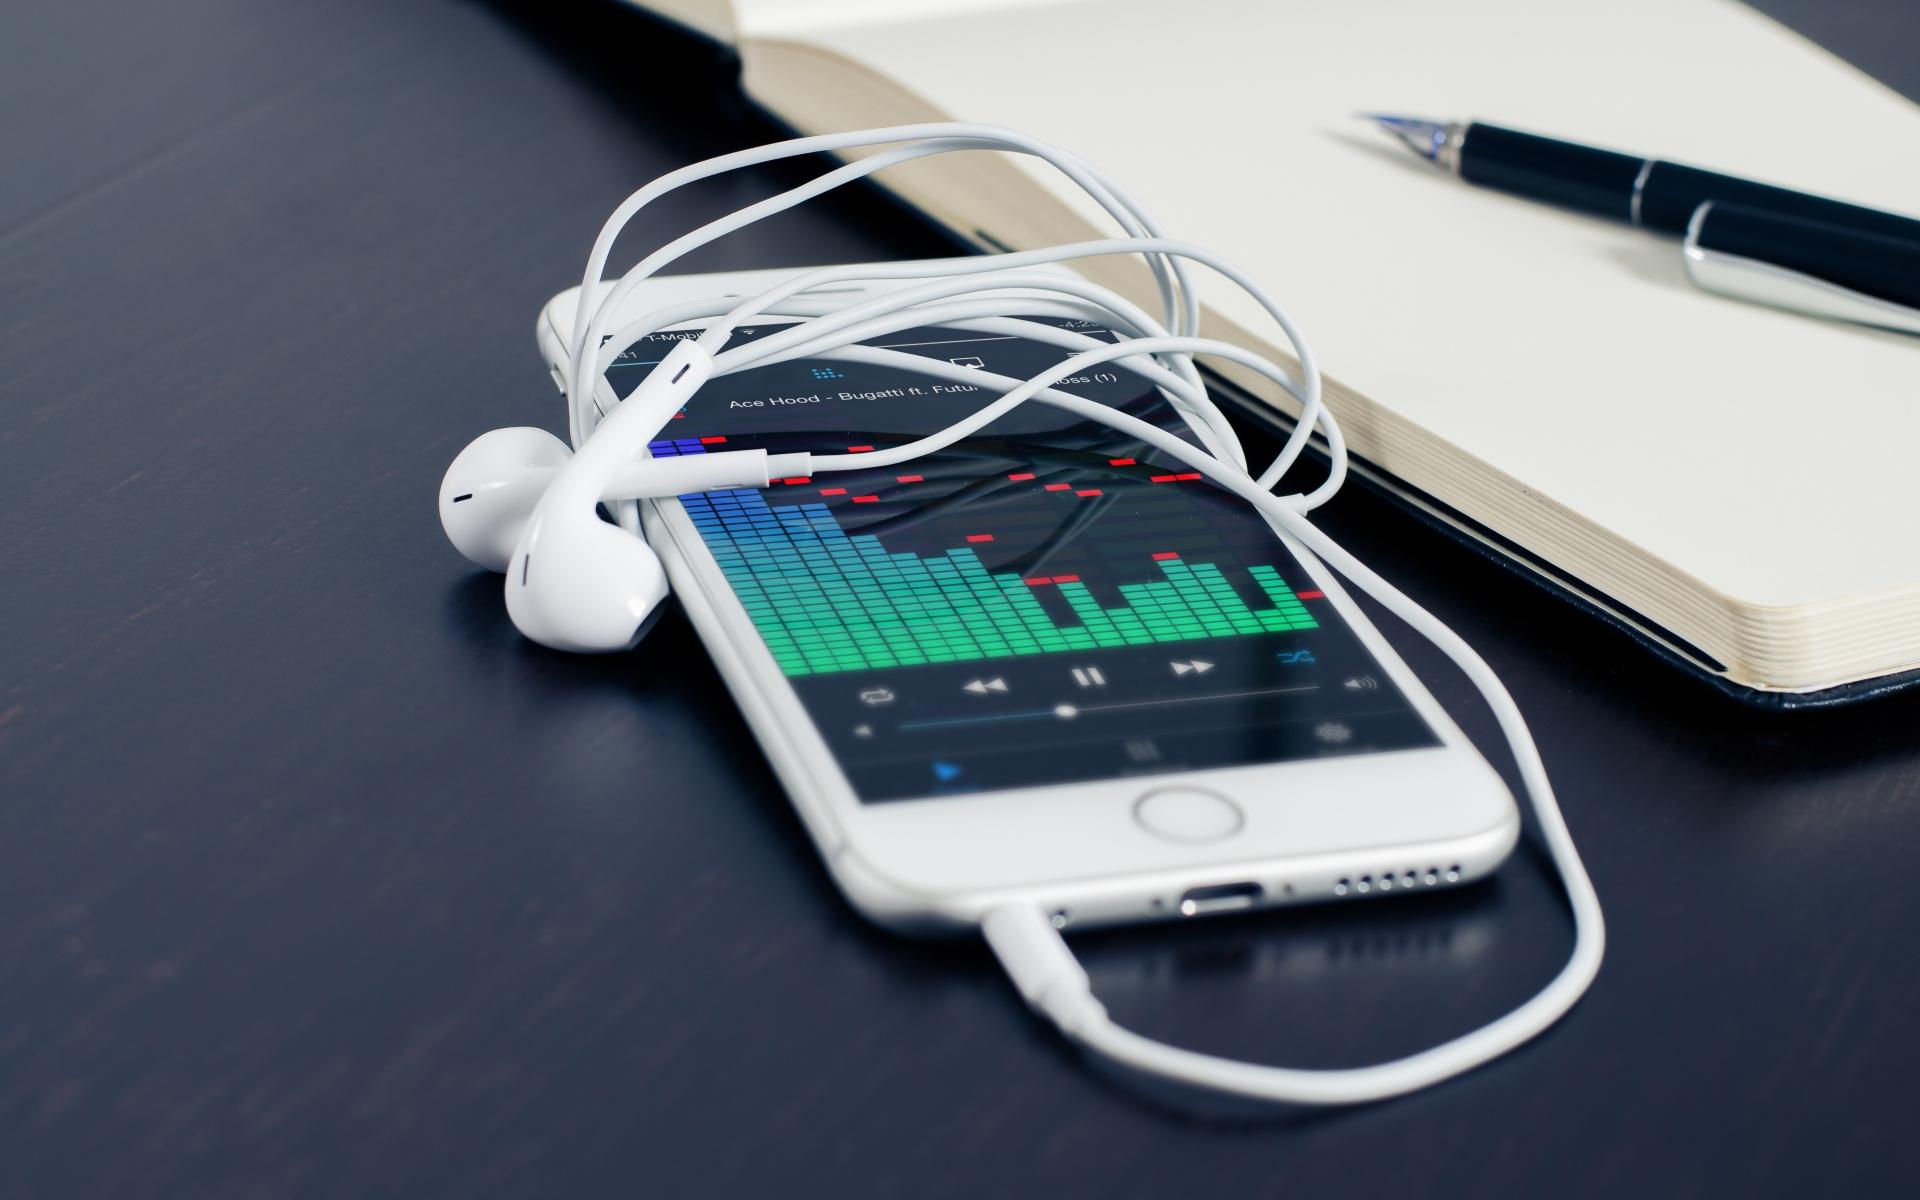 Картинки Iphone, apple, iphone 6, наушники, ноутбук, ручка фото и обои на рабочий стол